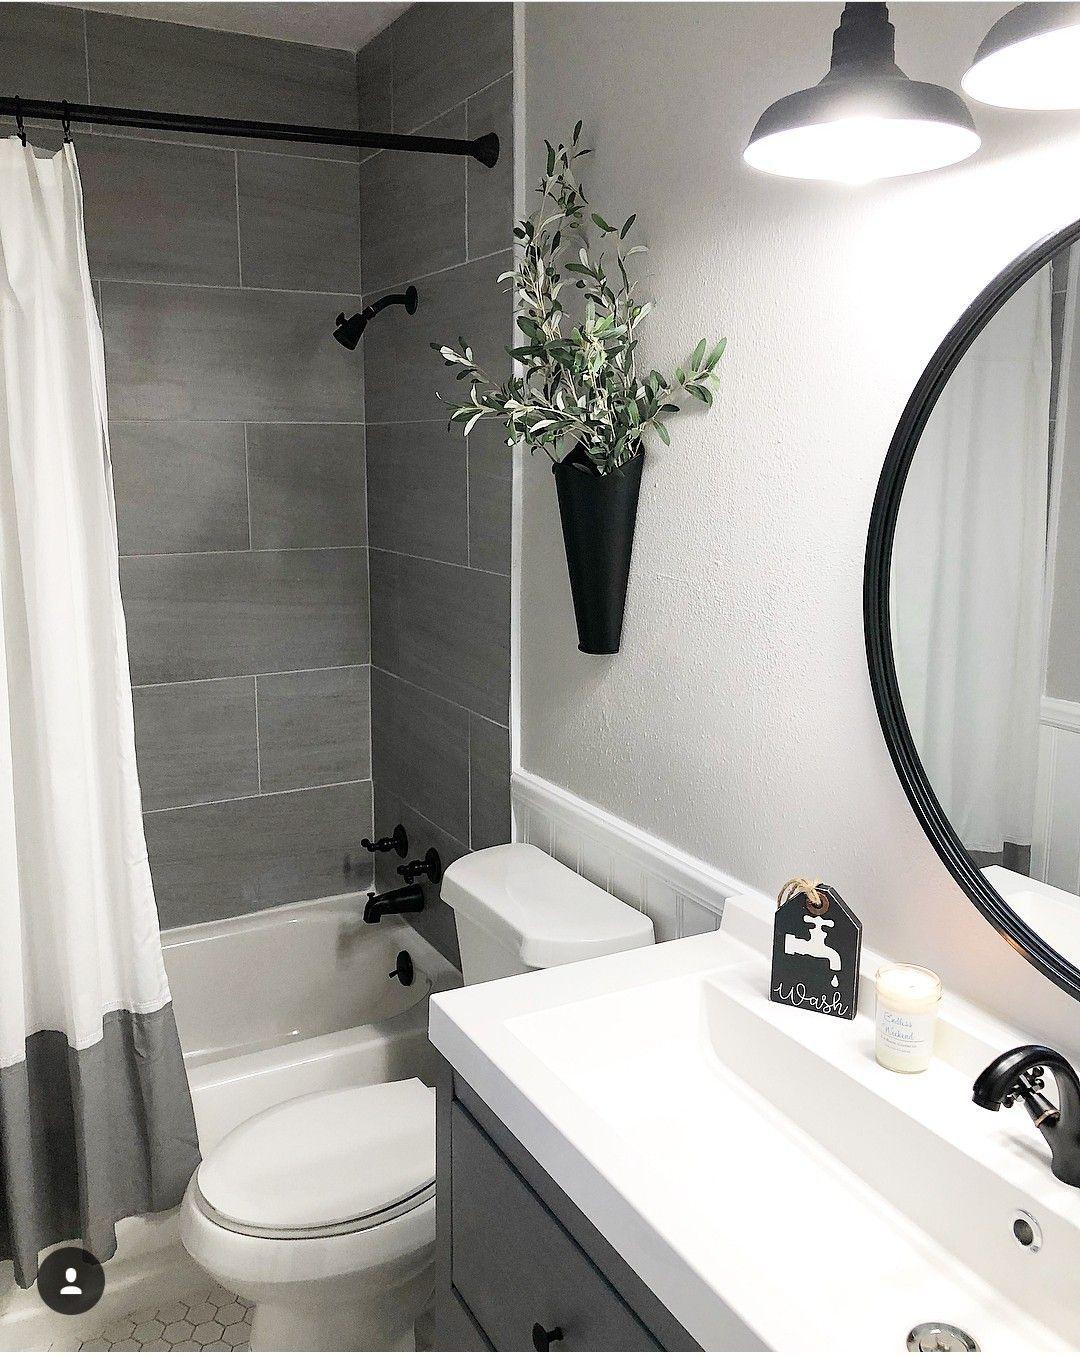 25 Brilliant Cheap Rustic Bathroom Decor | Apartment ...